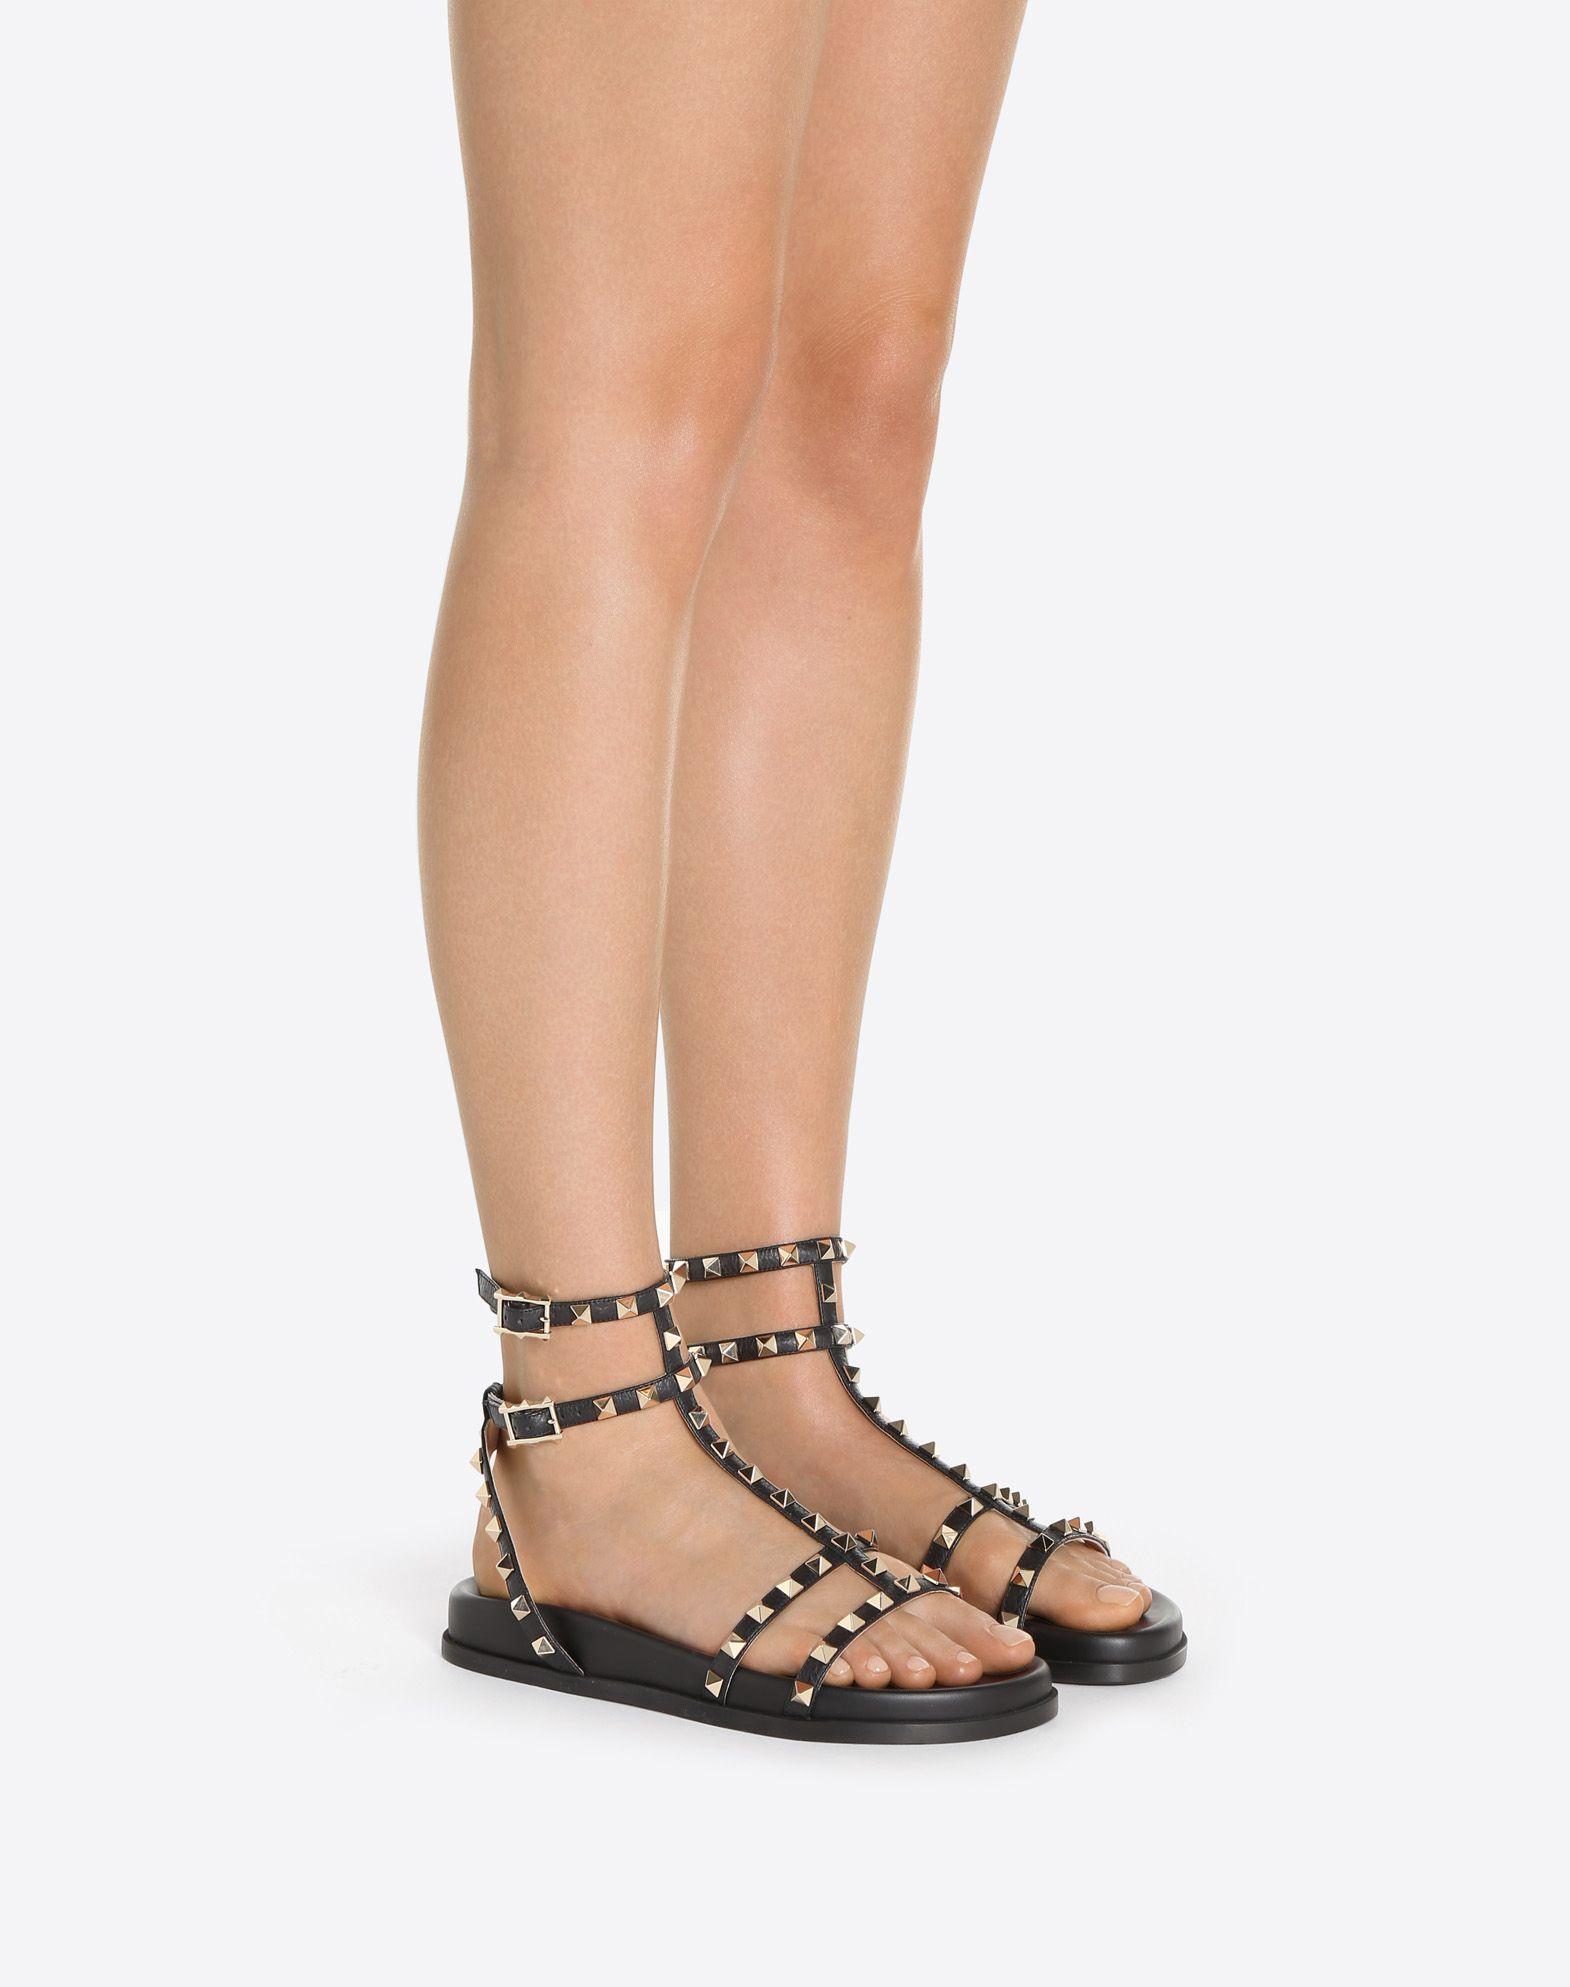 VALENTINO GARAVANI Rockstud Low Sandal Sandal D a